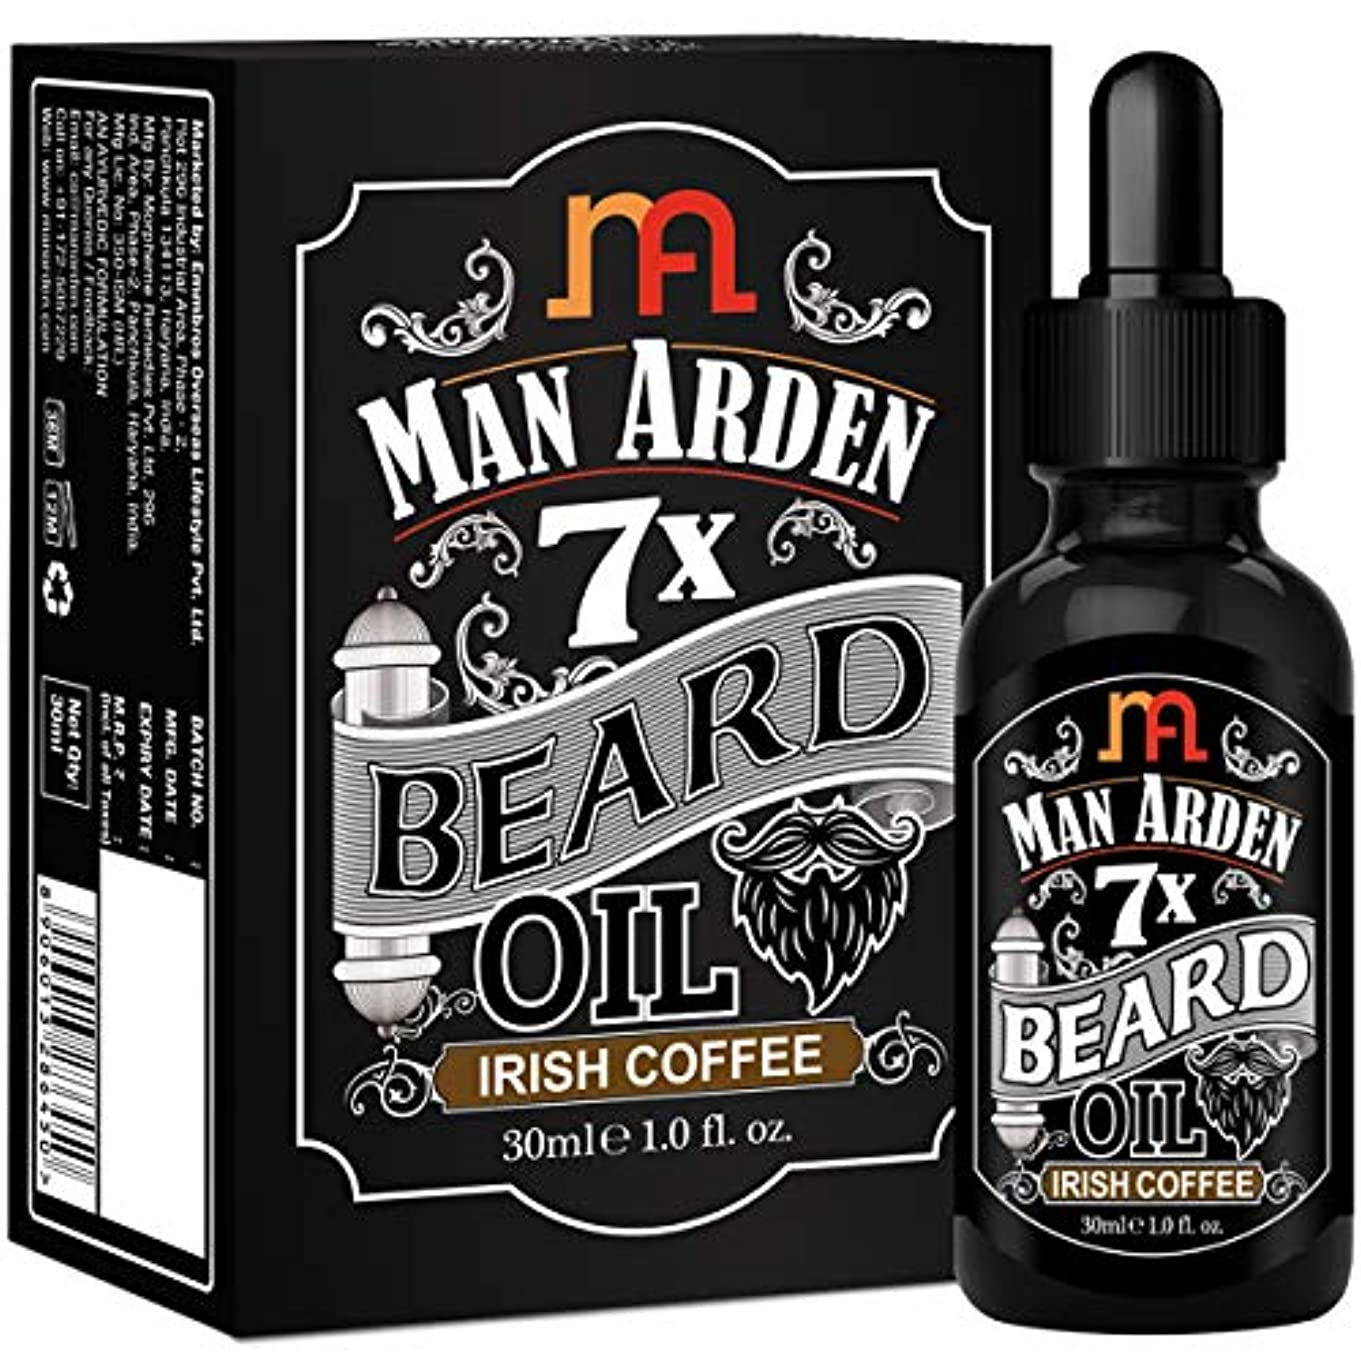 指額暴露Man Arden 7X Beard Oil 30ml (Irish Coffee) - 7 Premium Oils For Beard Growth & Nourishment